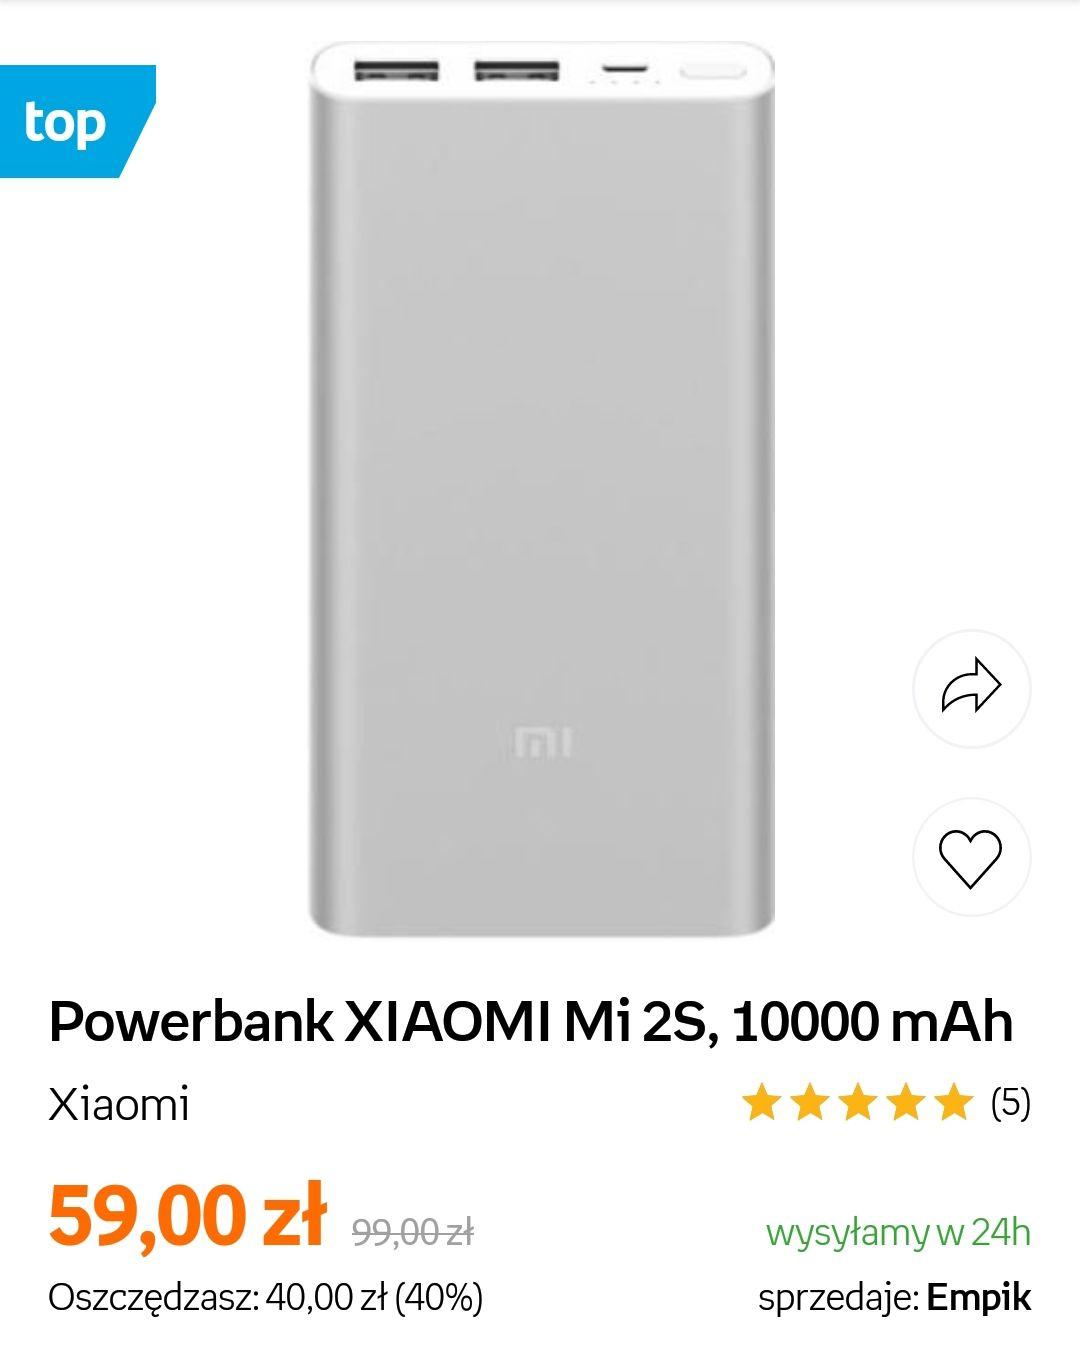 Powerbank XIAOMI Mi 2S 10000 mAh